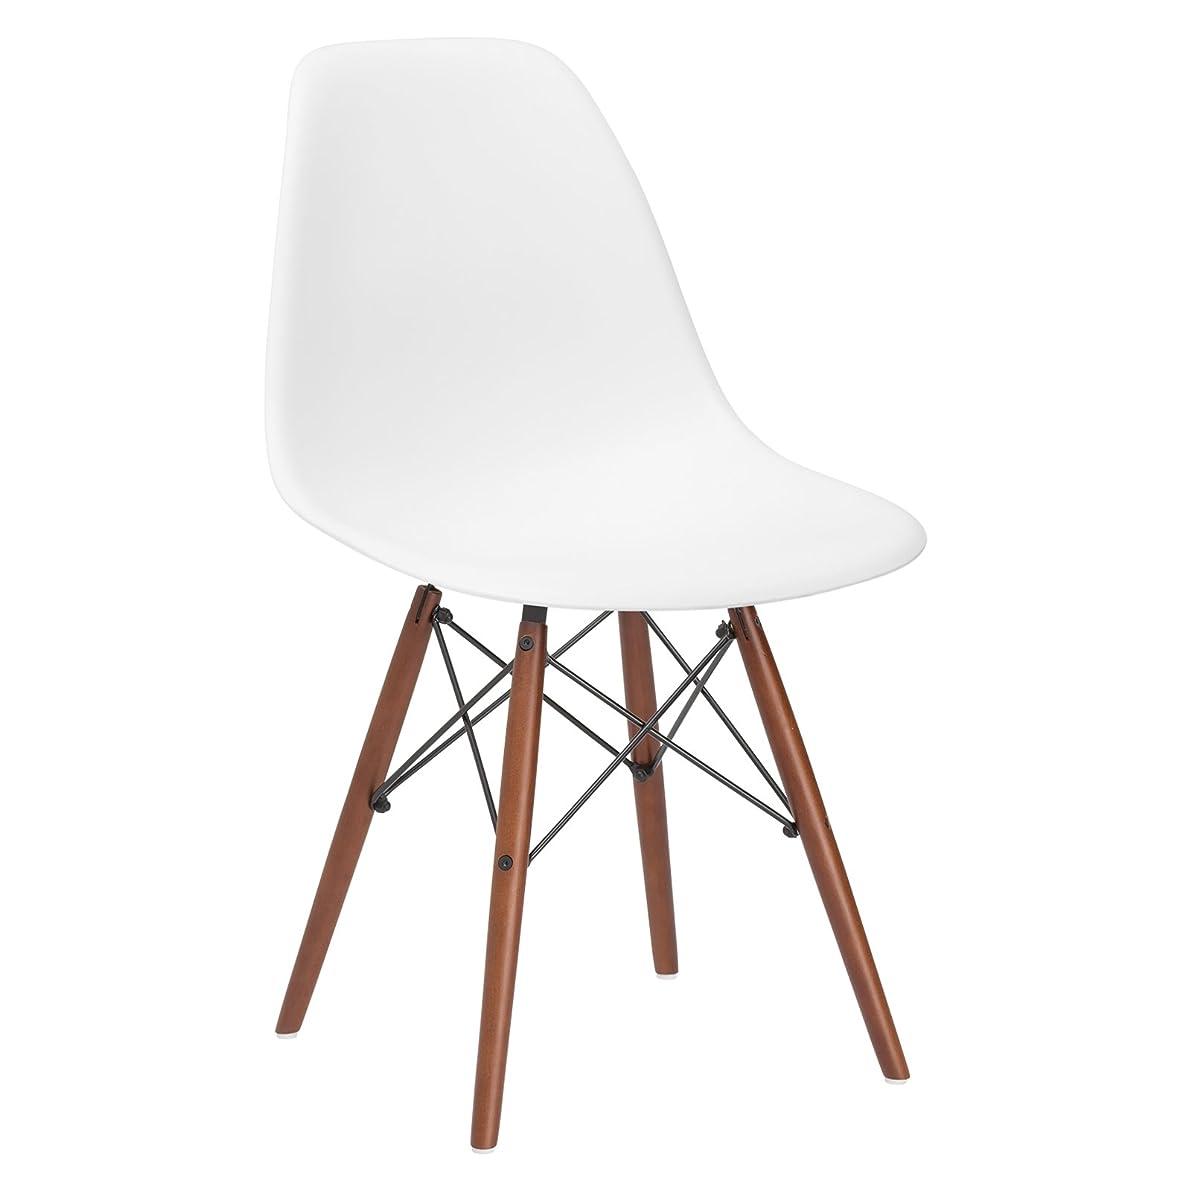 Poly and Bark Vortex Side Chair Walnut Legs, White